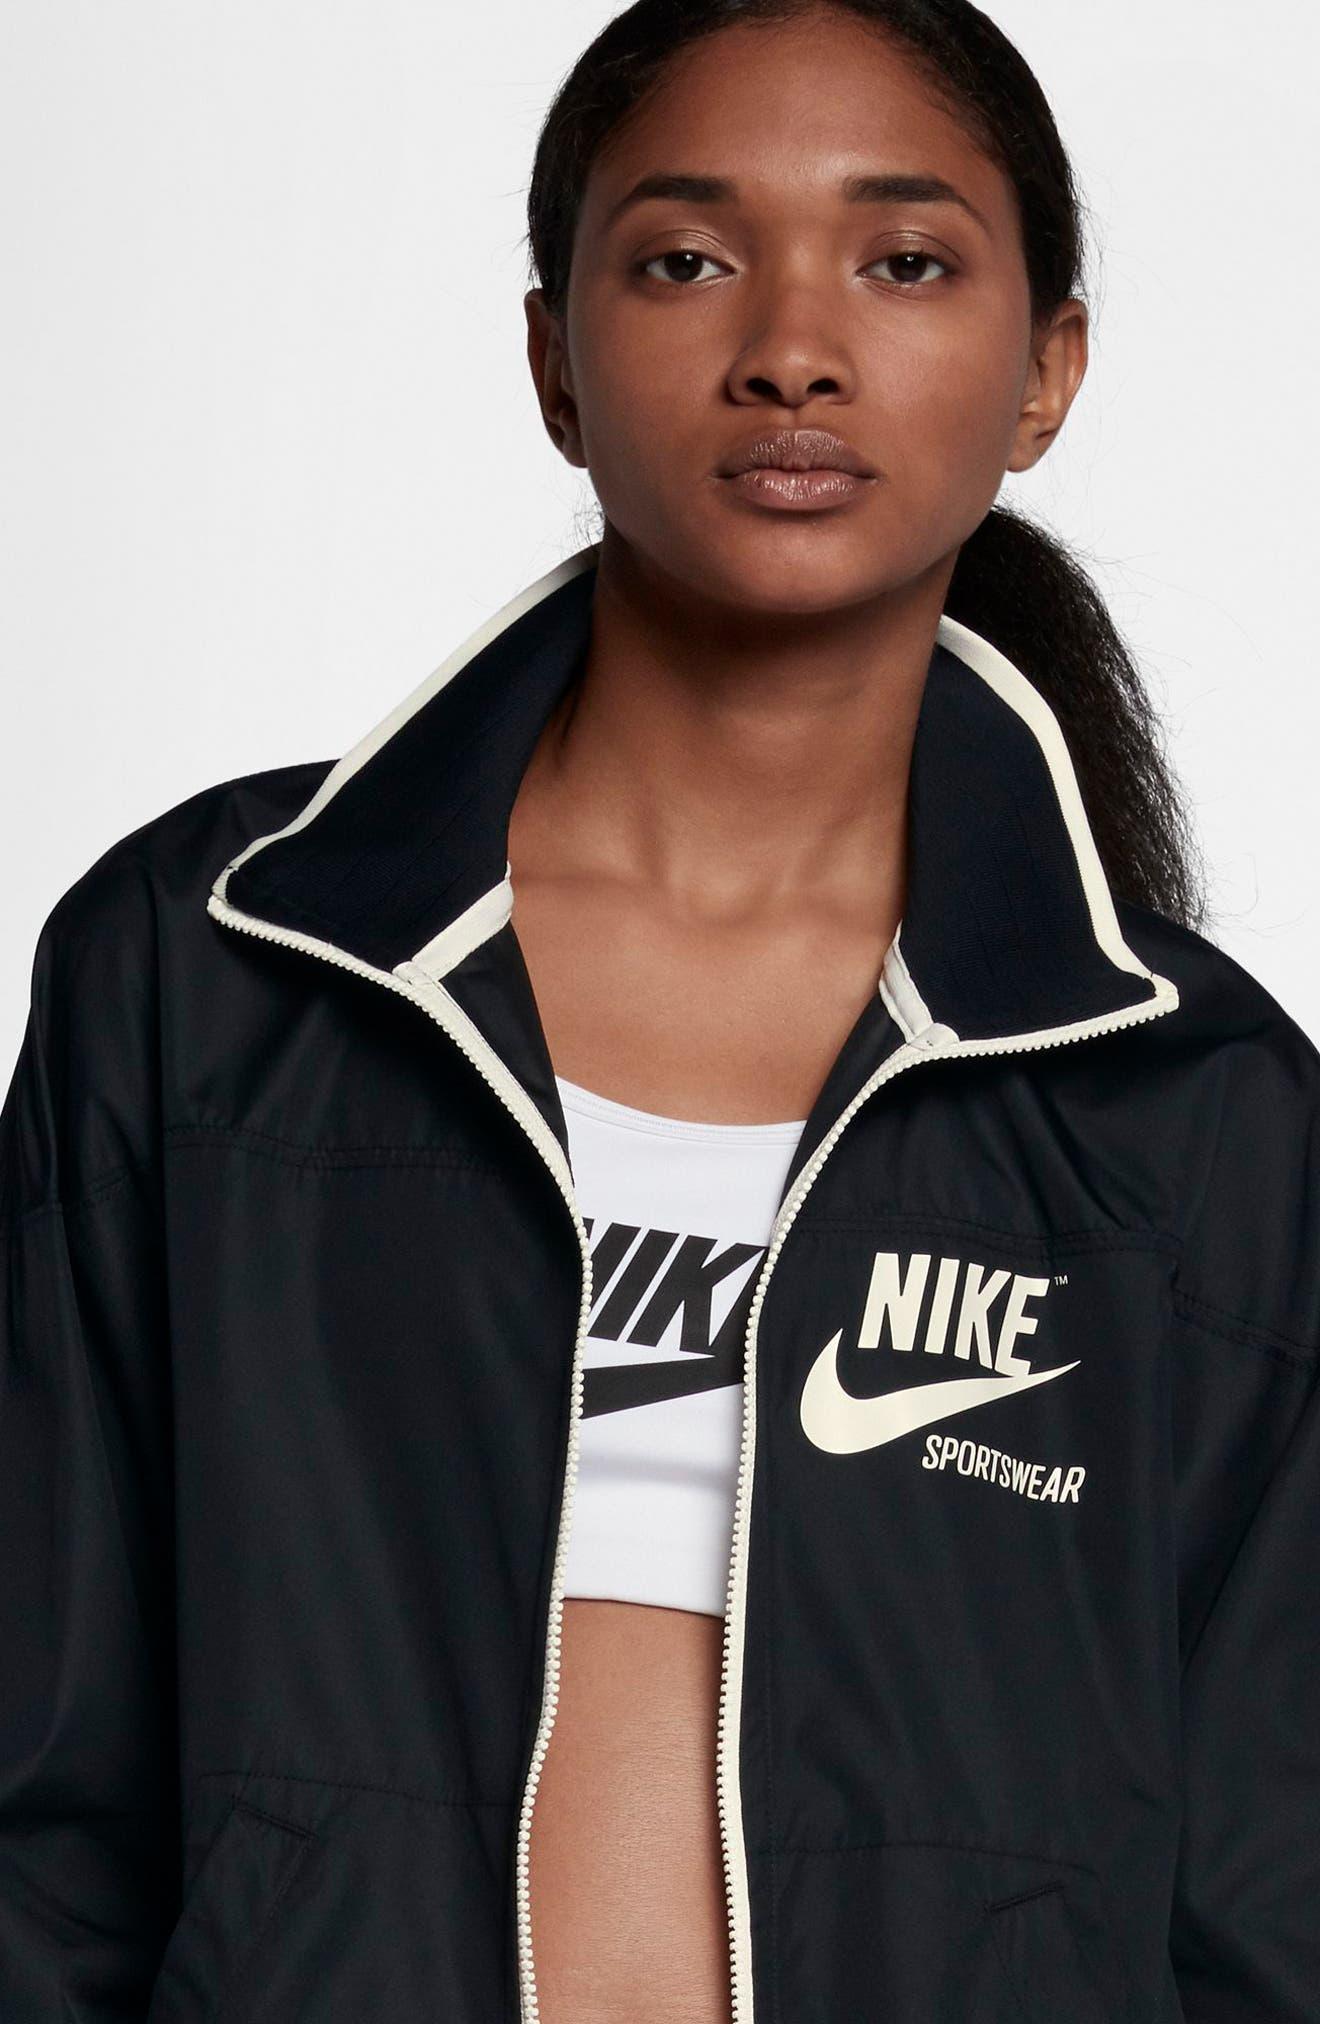 Sportswear Archive Jacket,                             Alternate thumbnail 7, color,                             Black/ Sail